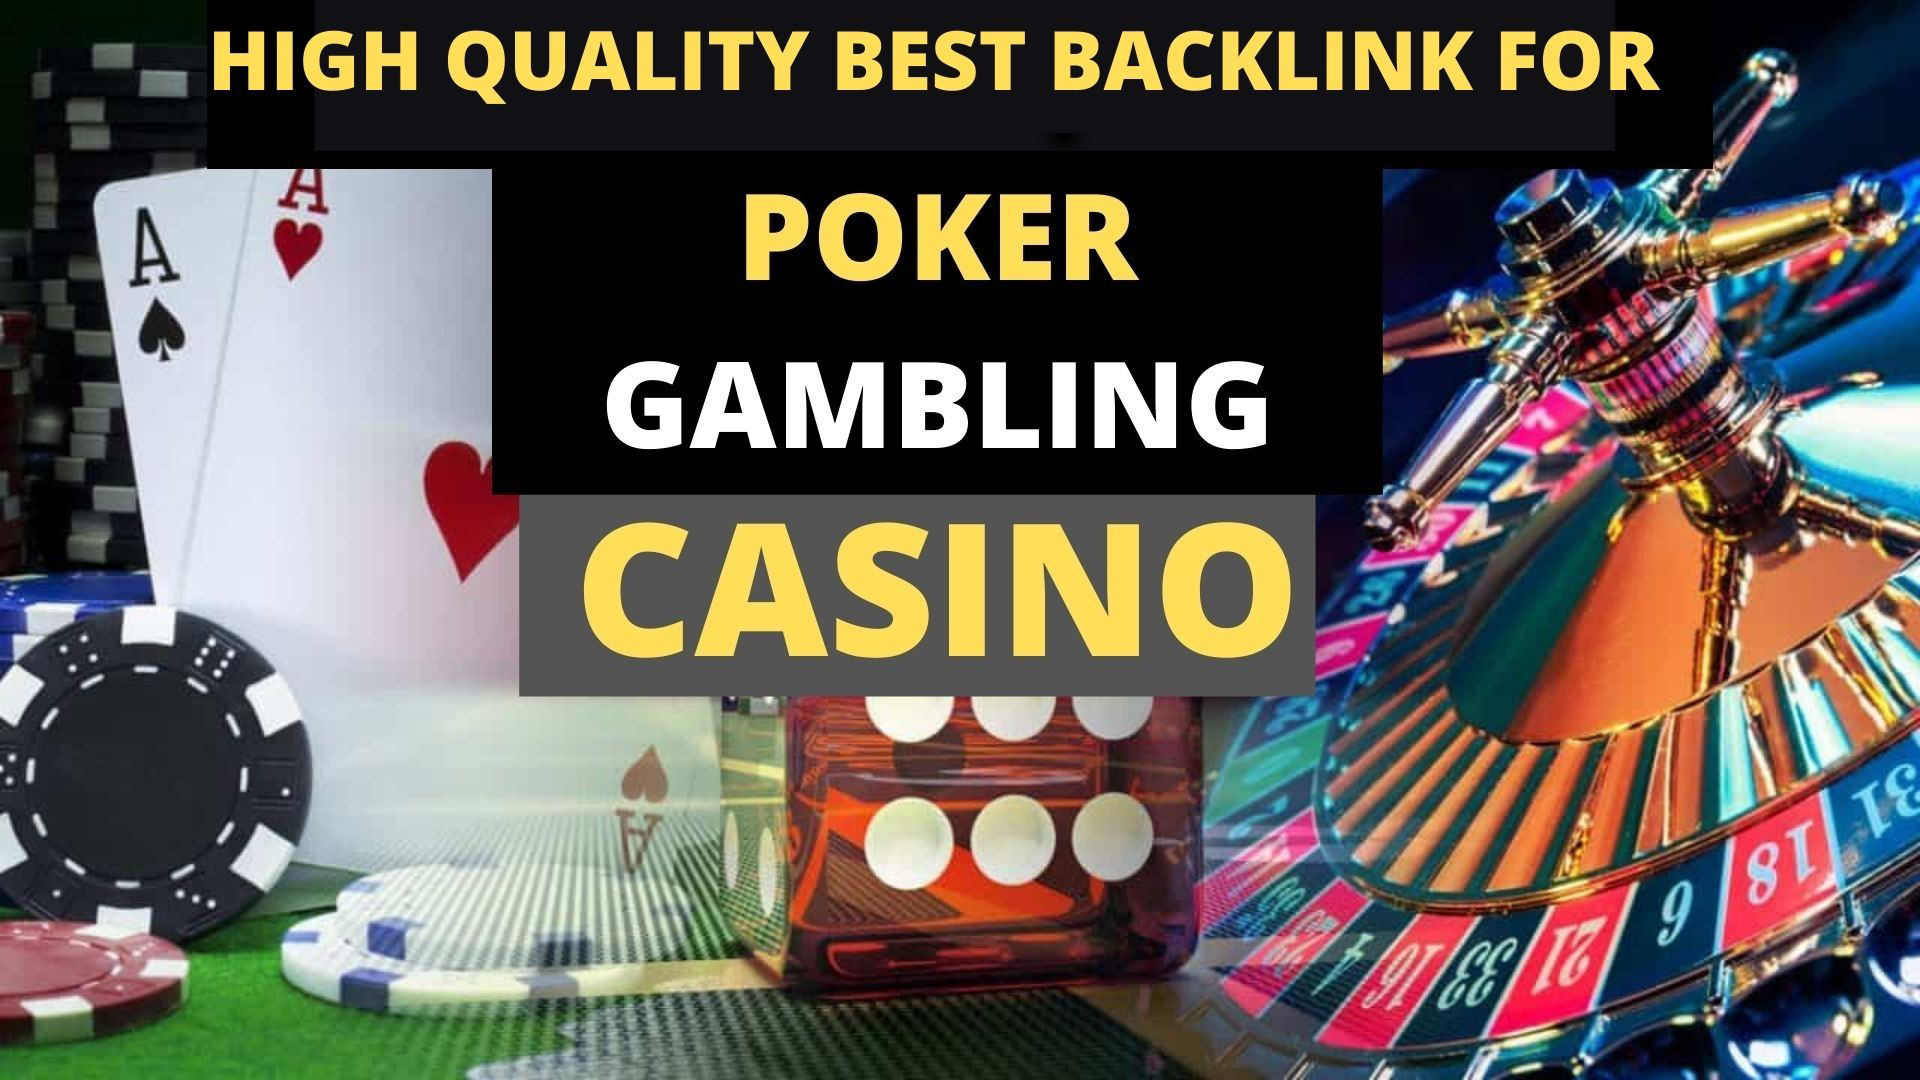 Powerfully 70 Homepage,  Situs Judi Bola,  Casino,  Gambling,  Sports,  Poker,  Betting PBN Backlinks